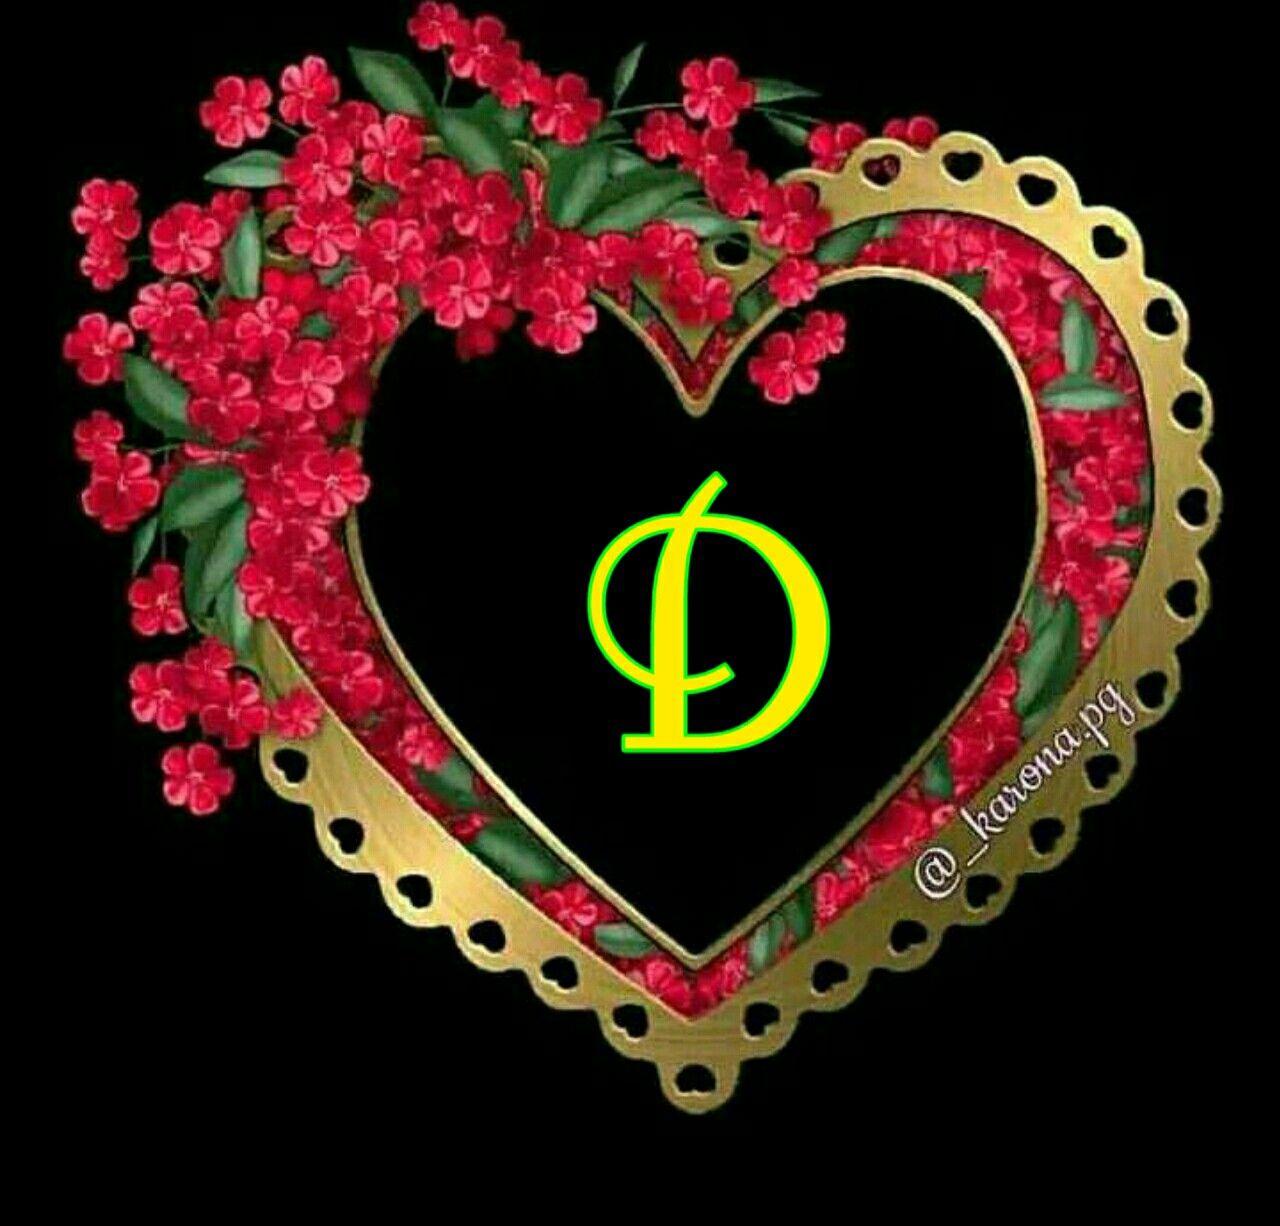 Pin By Delfina Pires De Lima On Name Letter Alphabet Wallpaper Love Wallpapers Romantic Heart Wallpaper